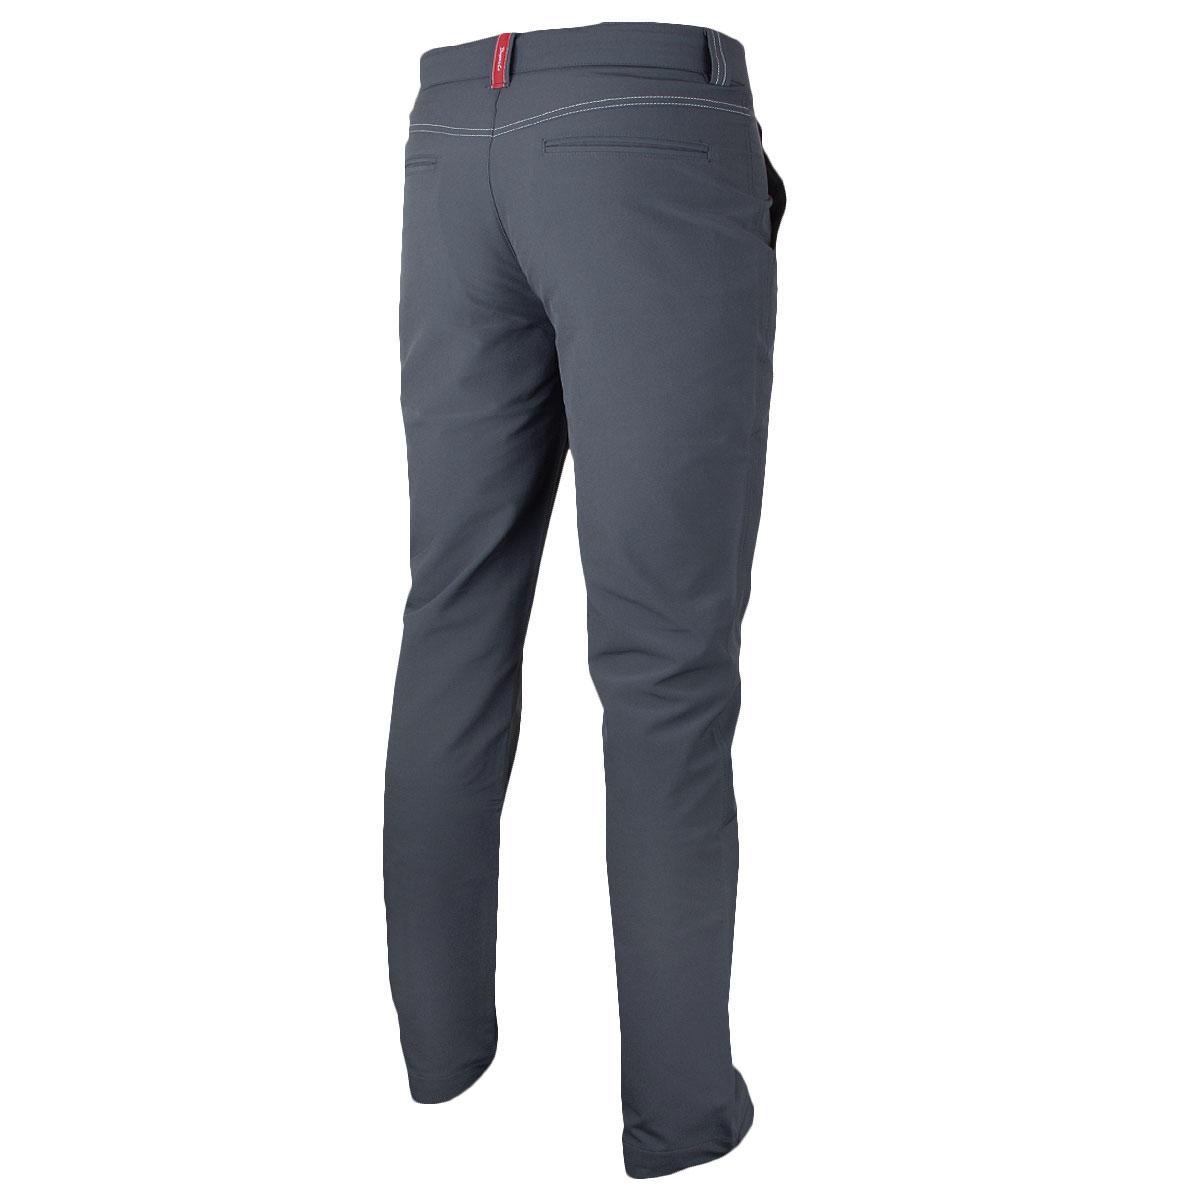 Dwyers-amp-Co-Mens-Golf-Trousers-Micro-Tech-Pant-43-OFF-RRP thumbnail 7